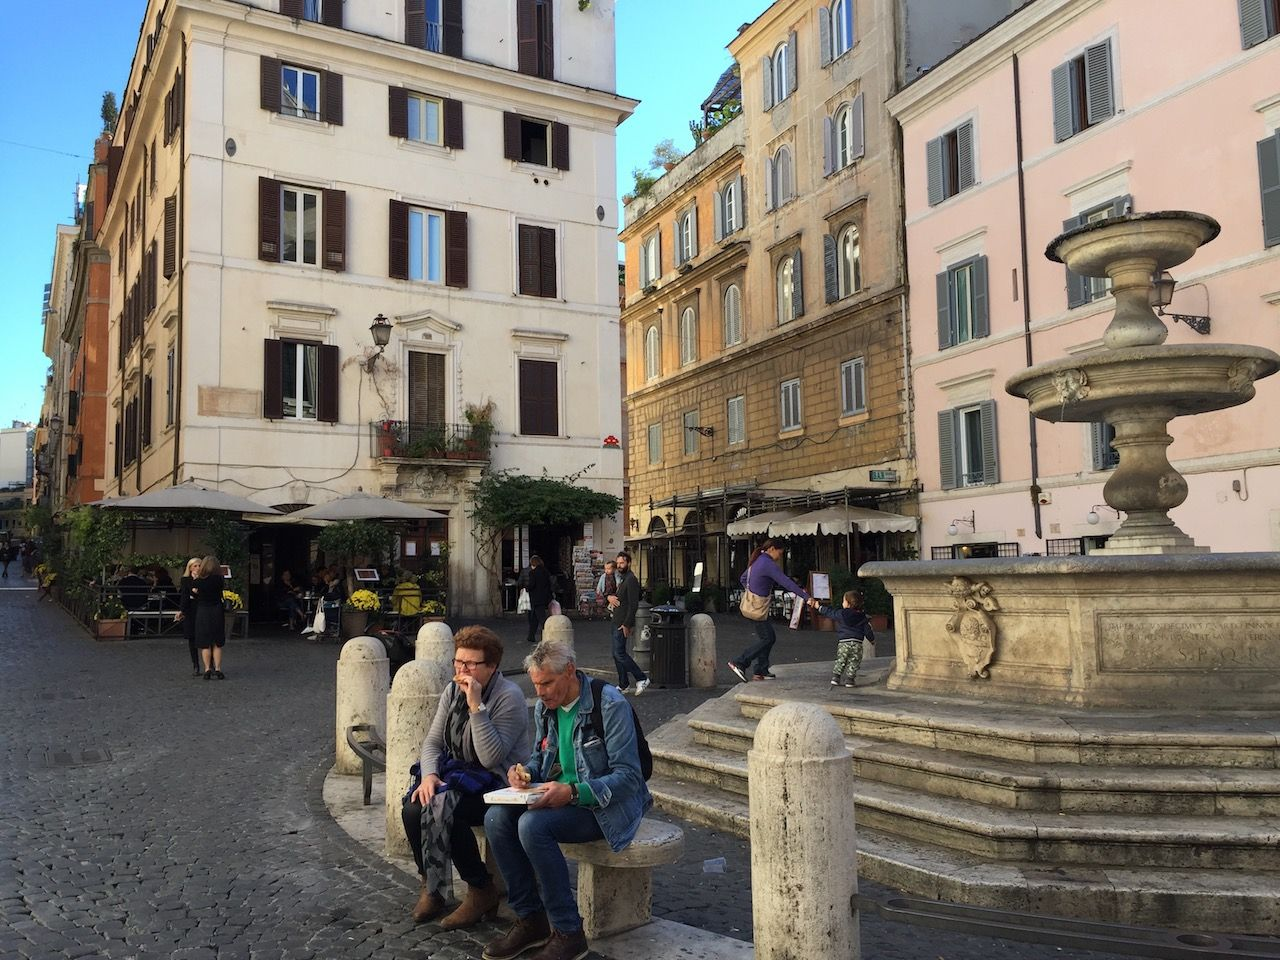 A vida na Piazza. #roma #rome #receitaitaliana #receitas #receita #recipe #ricetta #cibo #culinaria #italia #italy #cozinha #belezza #beleza #viagem #travel #beauty #piazza #praca #square #monti